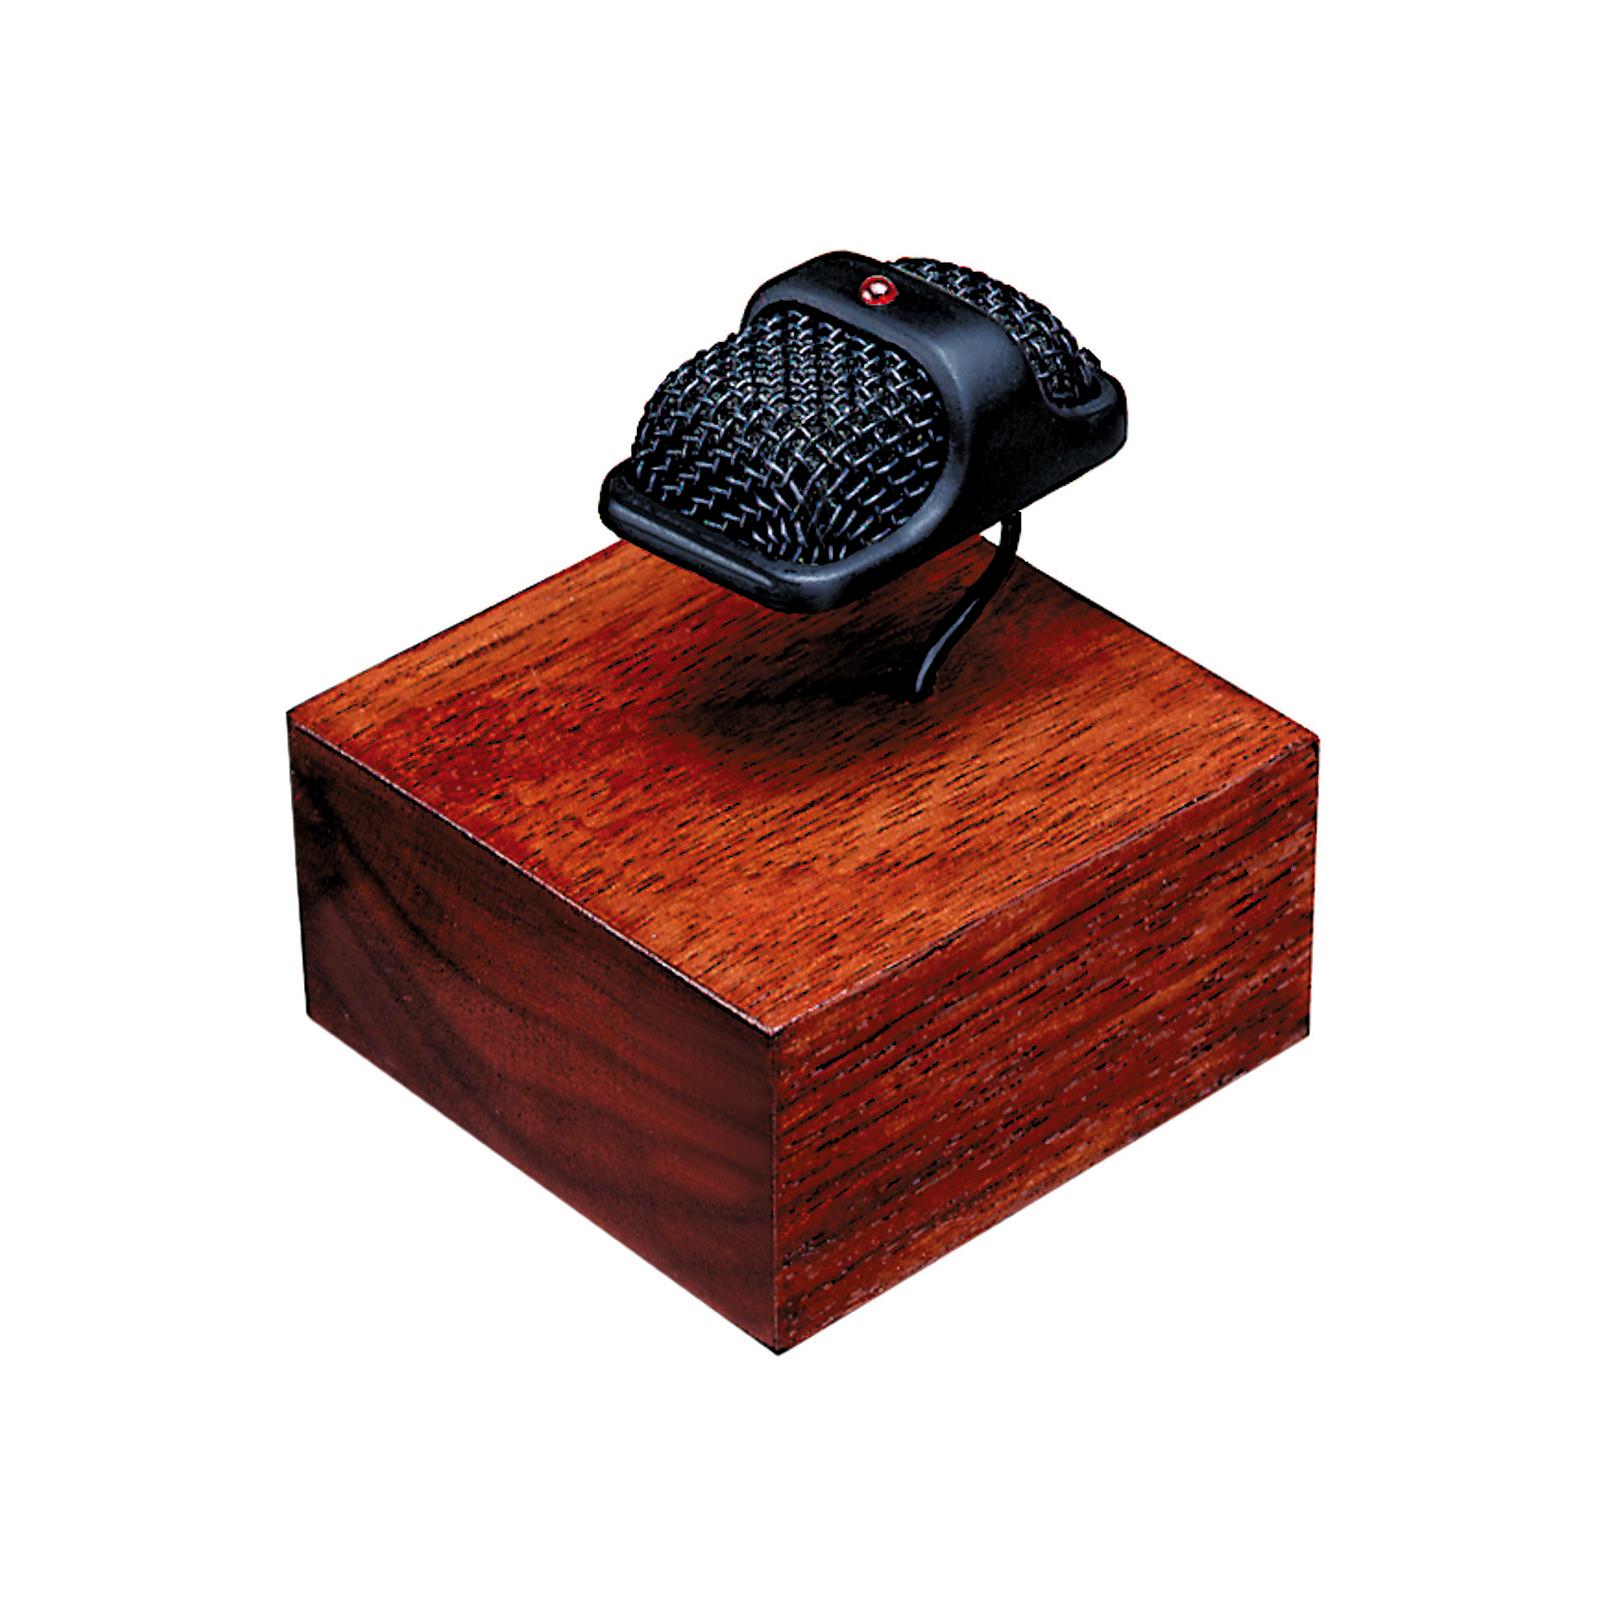 MB4 - Black - Miniature boundary layer microphone - Hero